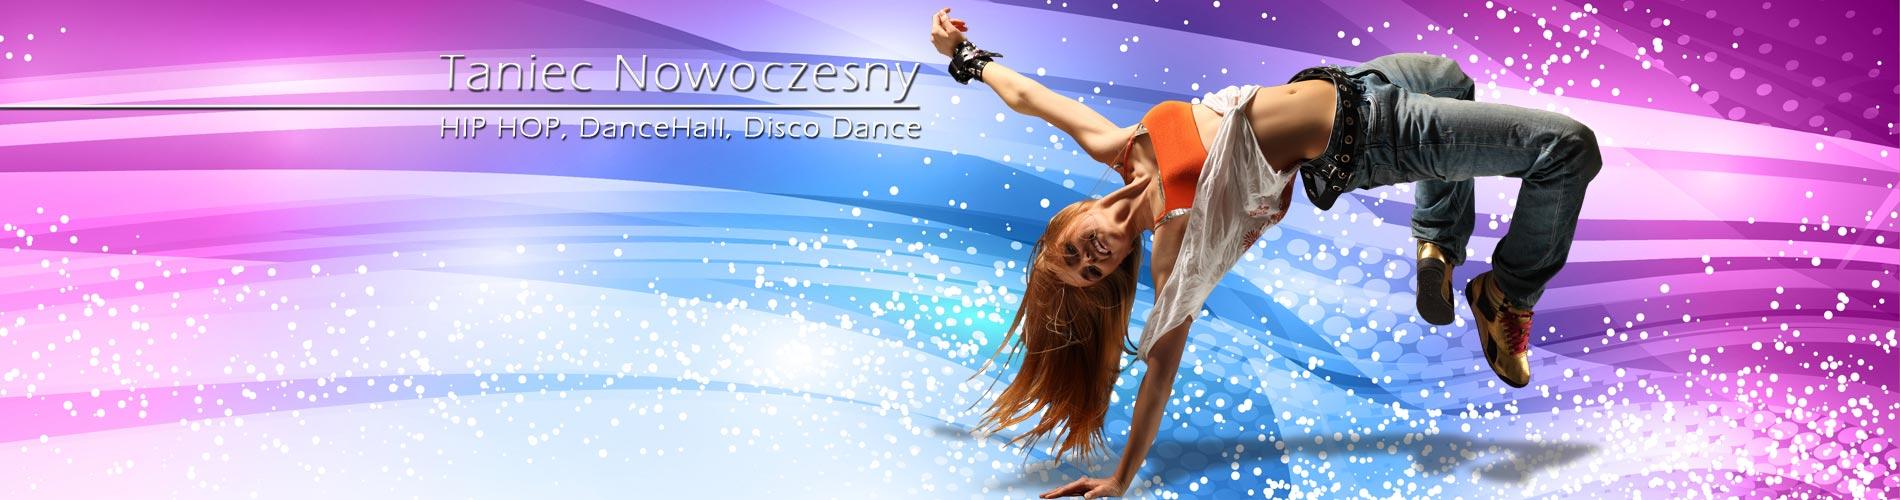 TANIEC NOWOCZESNY  -  HIP HOP New Style